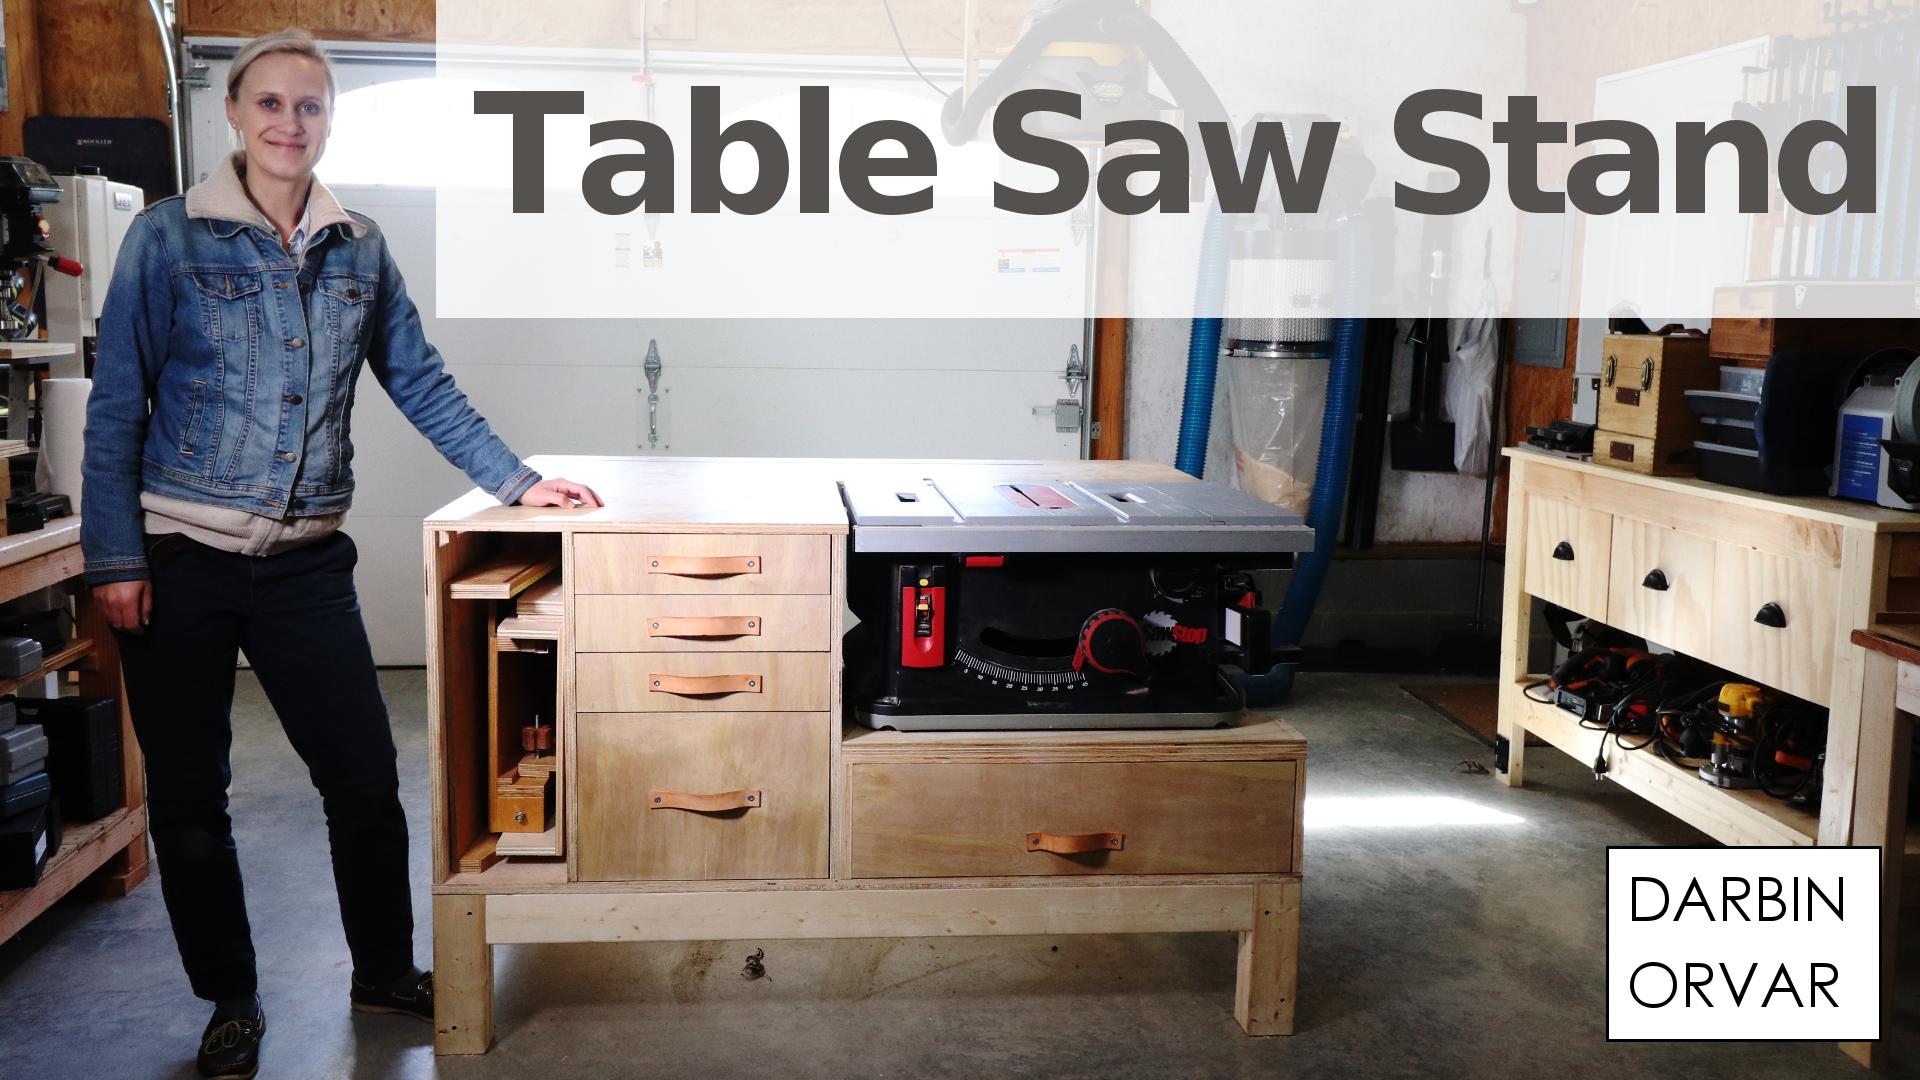 thumb_tablesawstand01.JPG